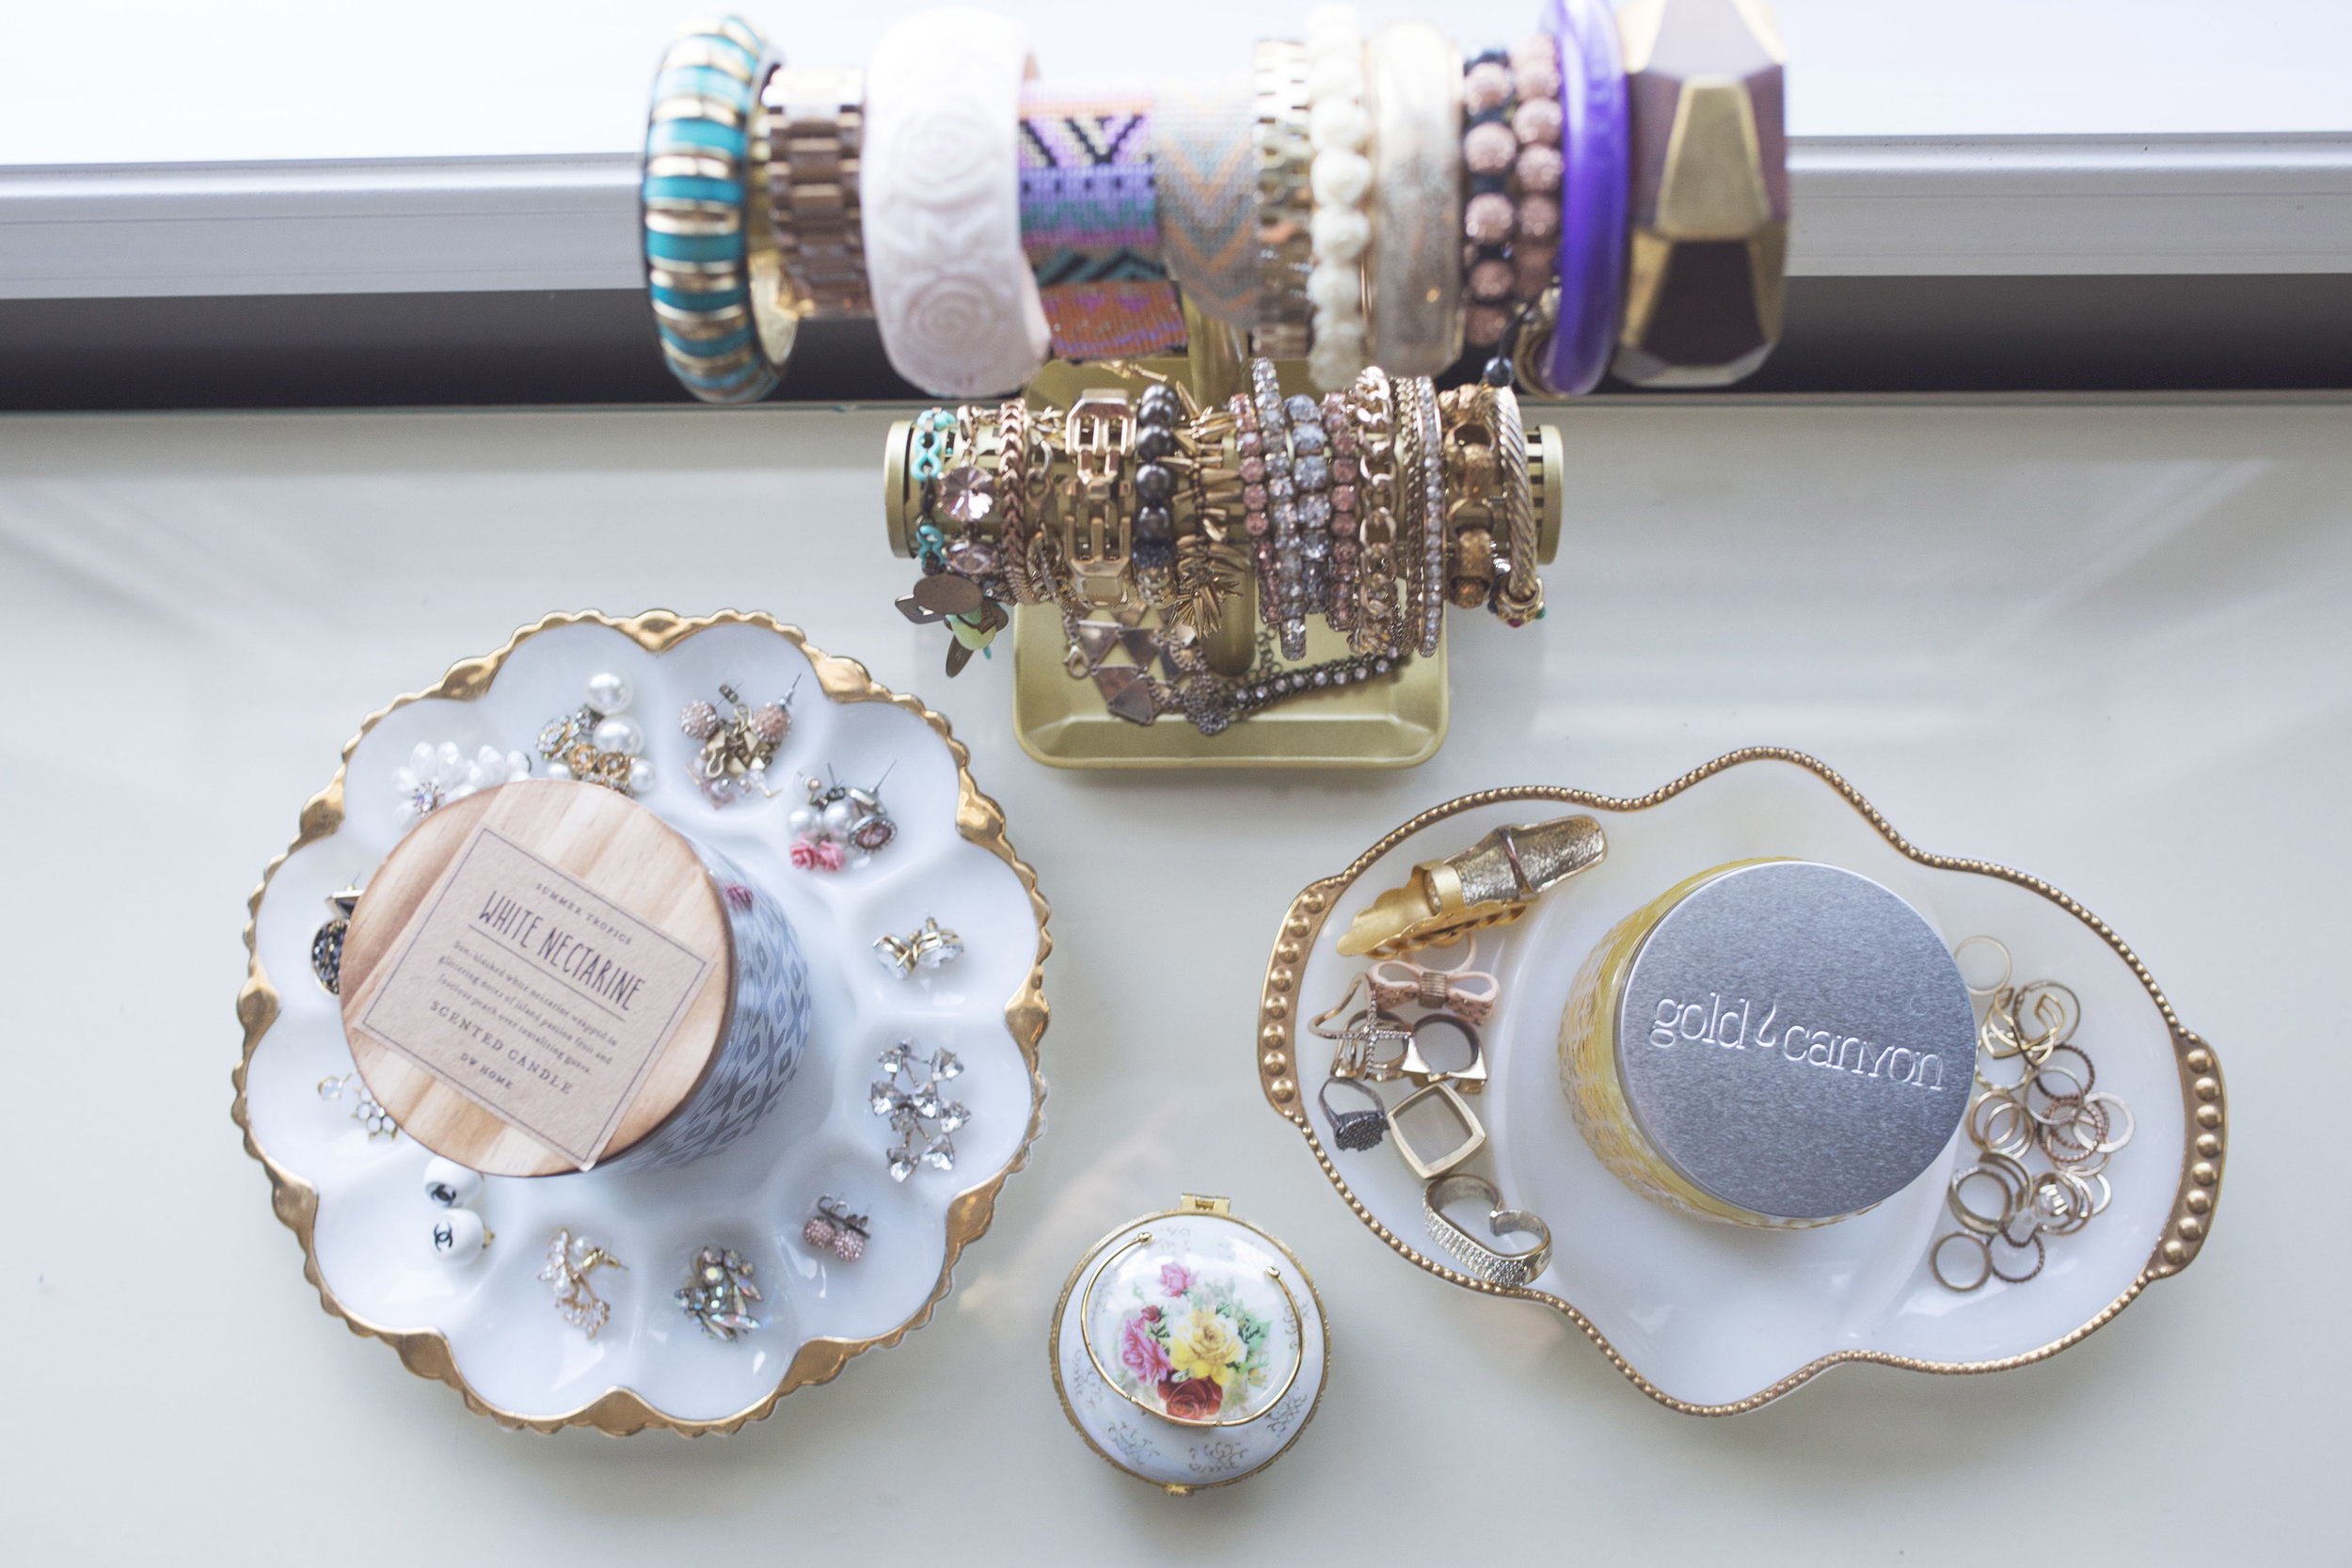 Desiree Martin jewellery storage ideas 4.jpg